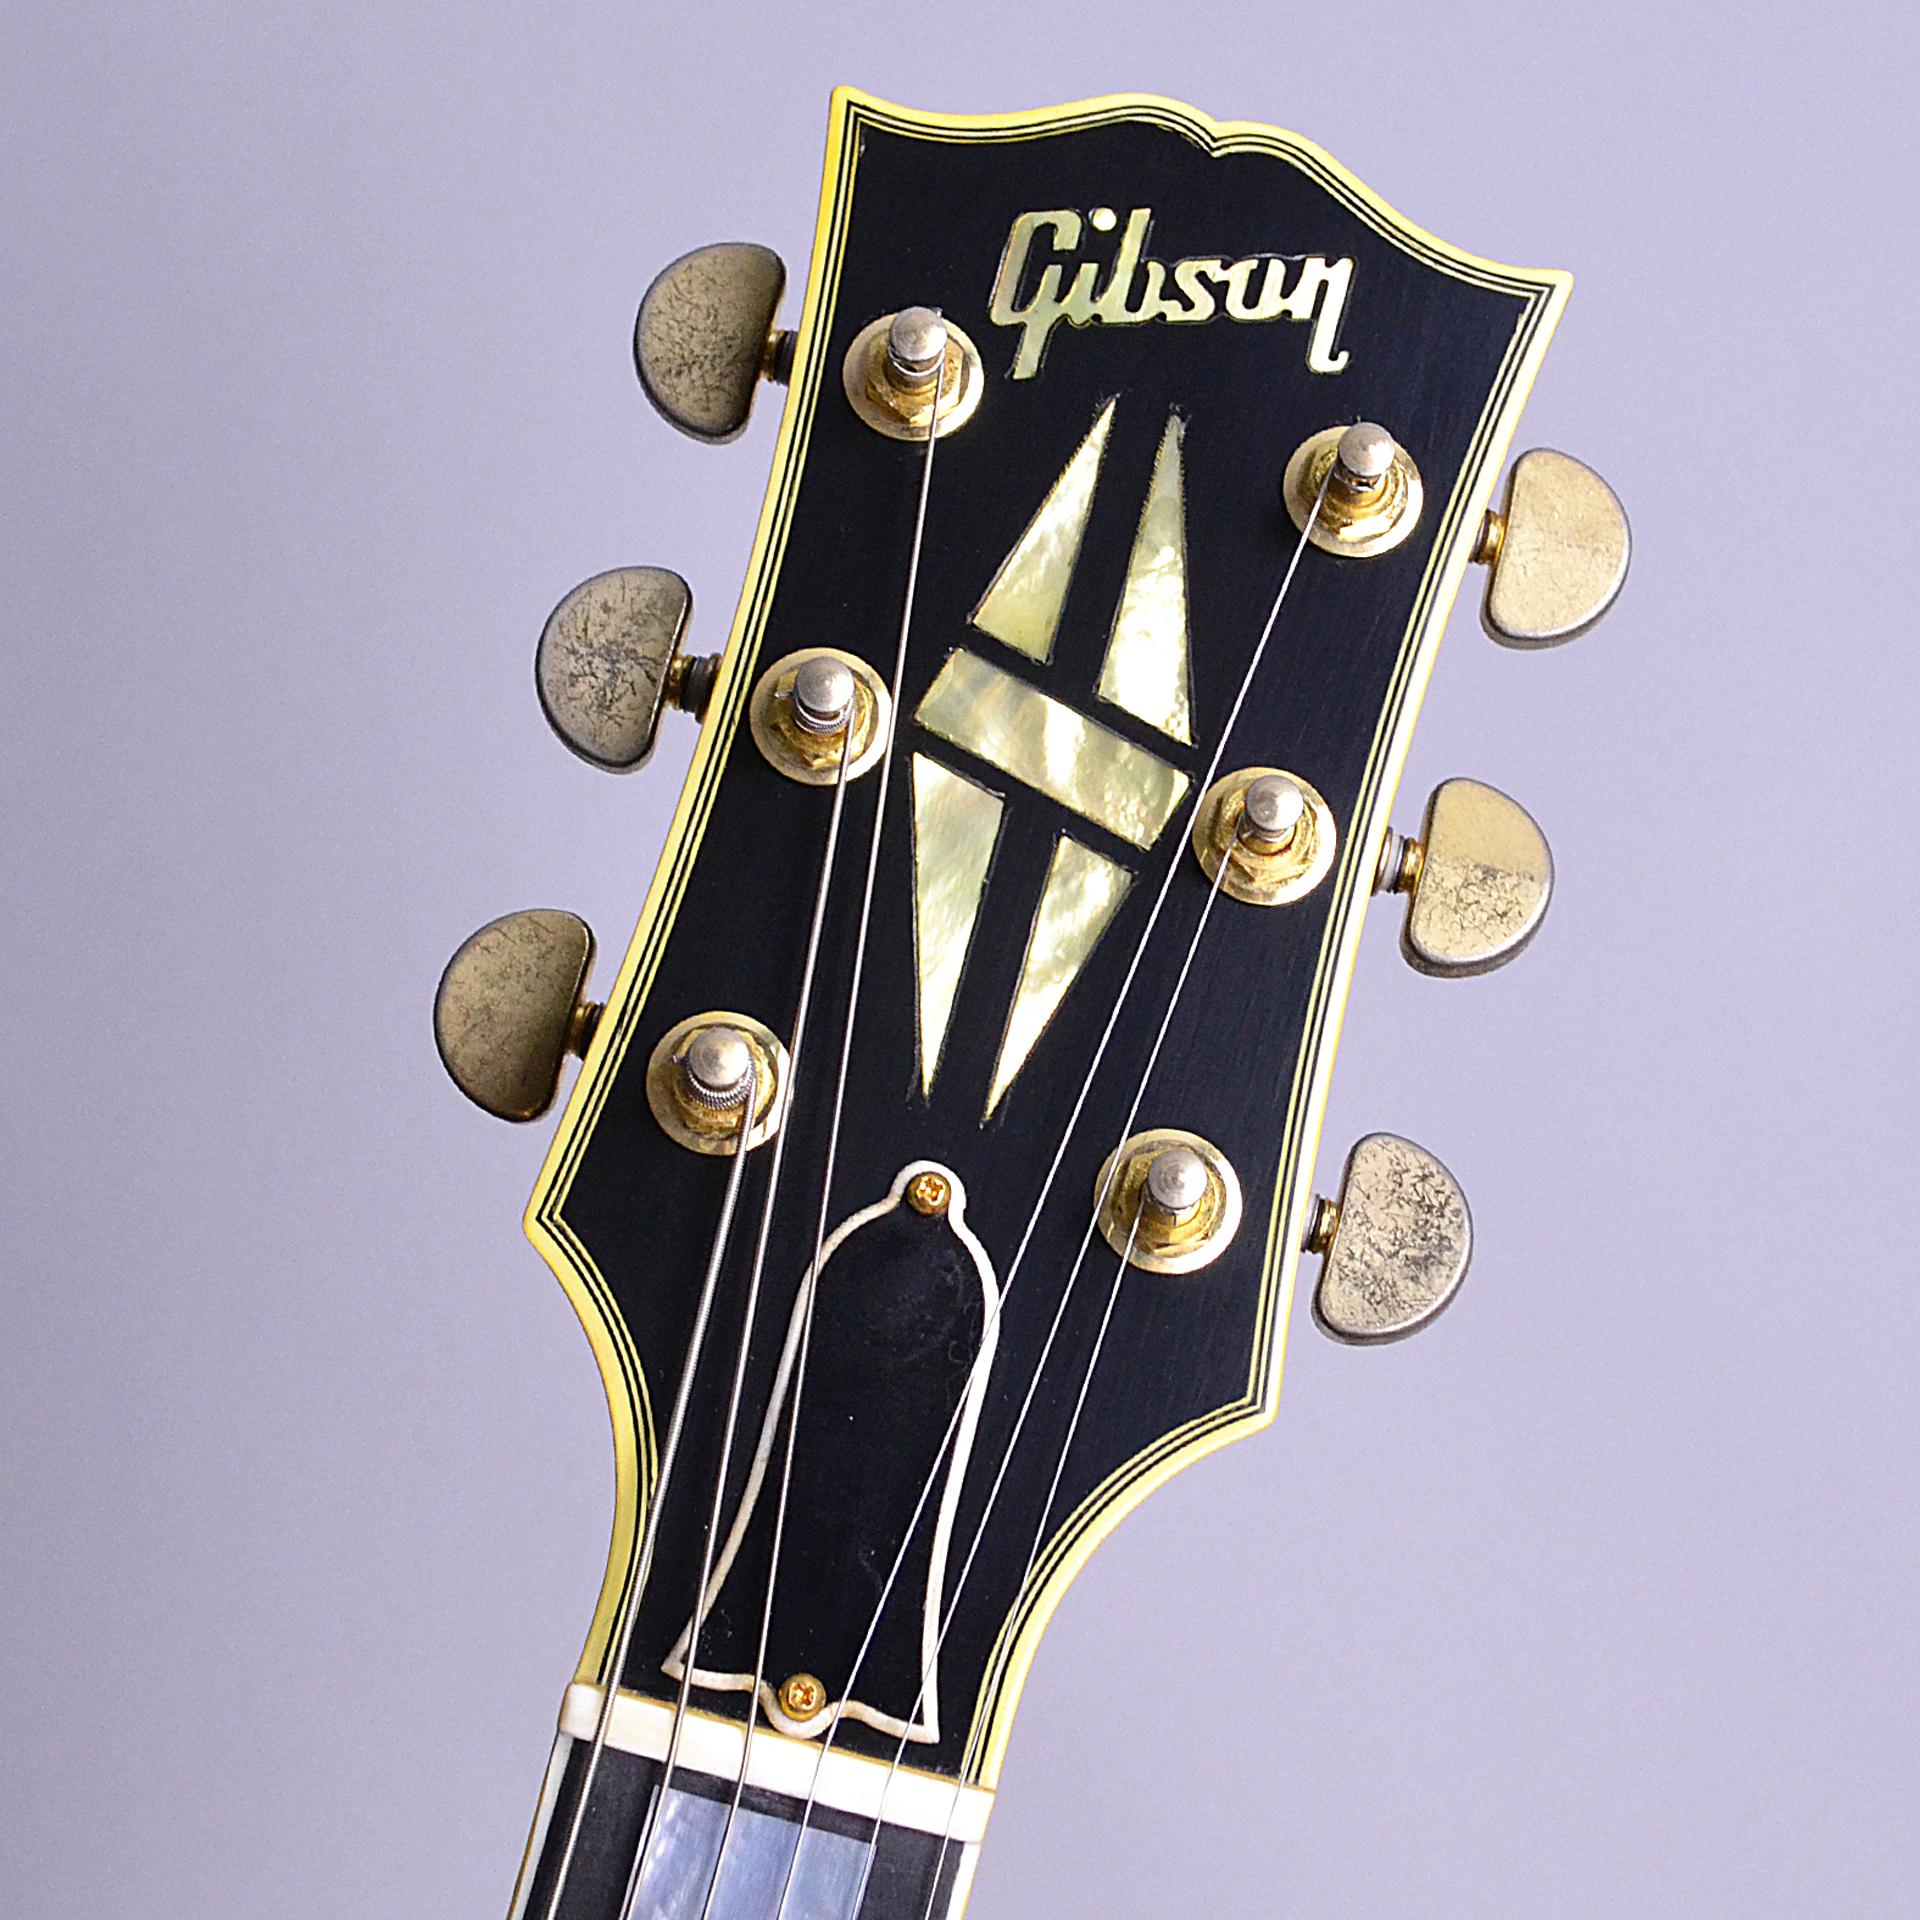 ES-355 Ebony Bigsby VOSのヘッド裏-アップ画像